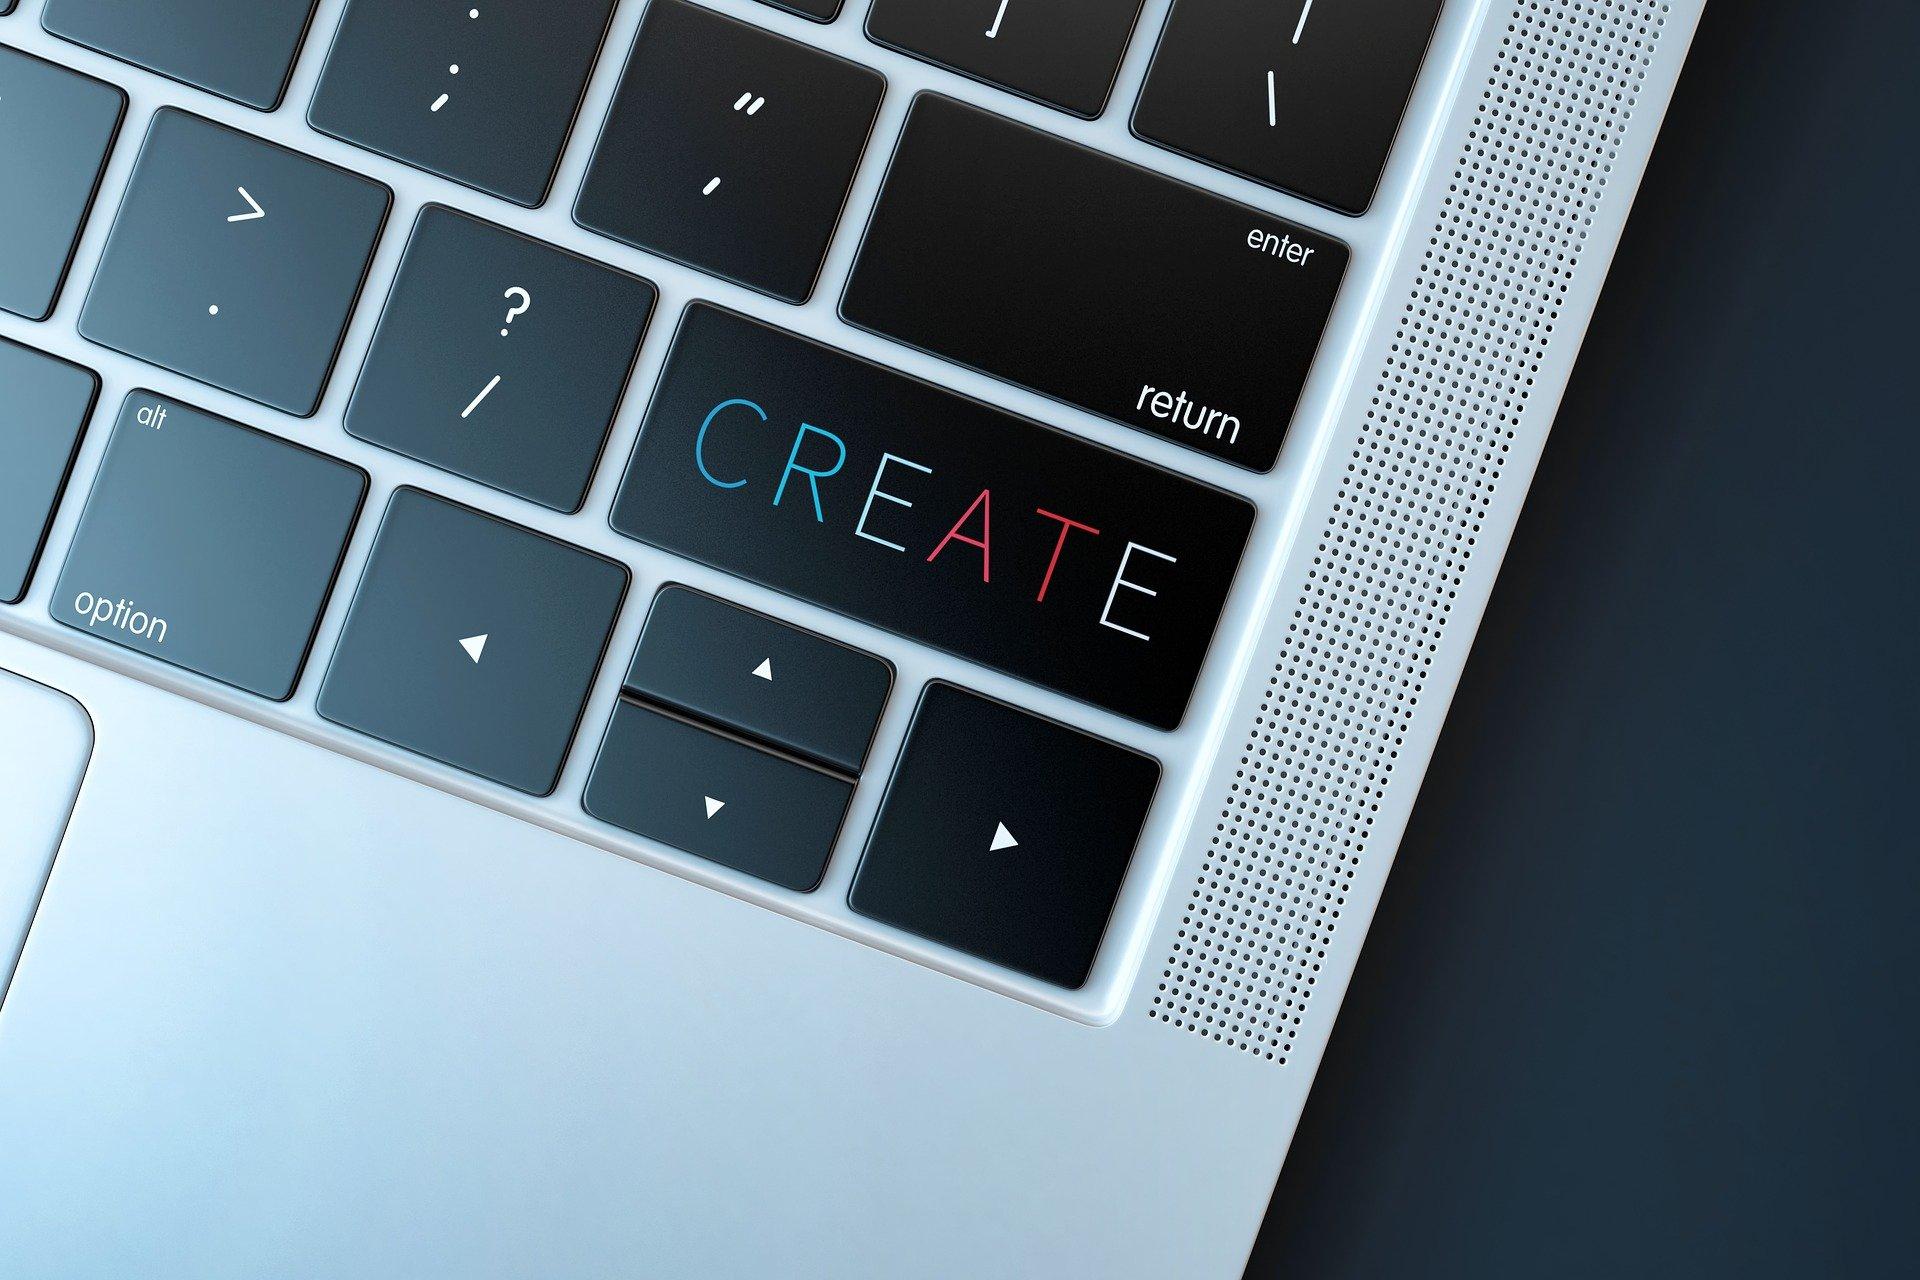 2 create-3026190_1920